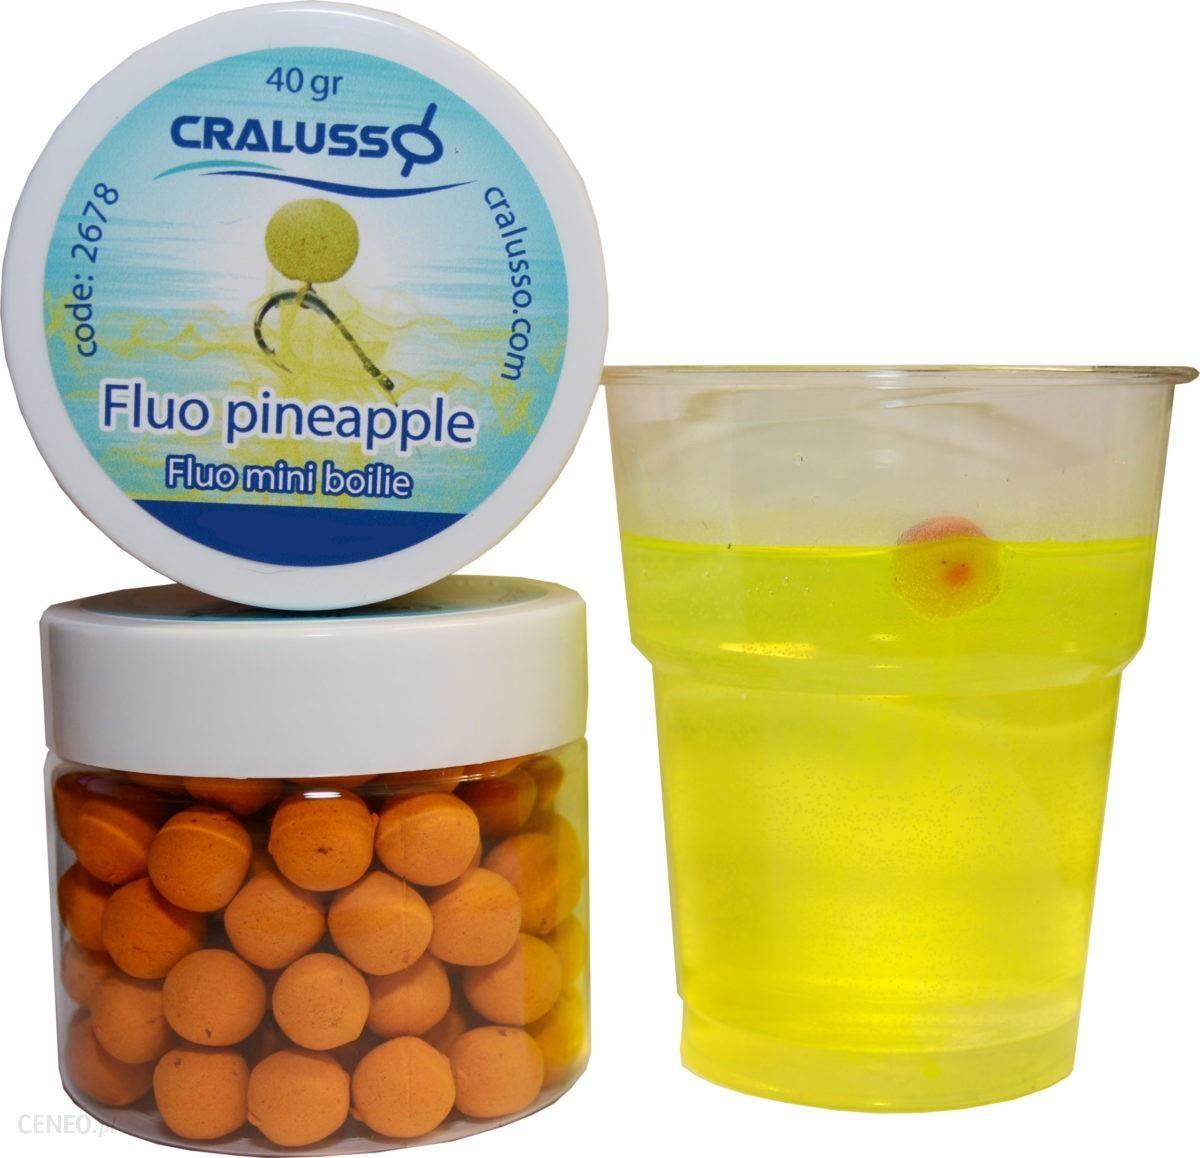 Cralusso Kulki Fluo Mini Boilie 10Mm 40G Pineapple 2665